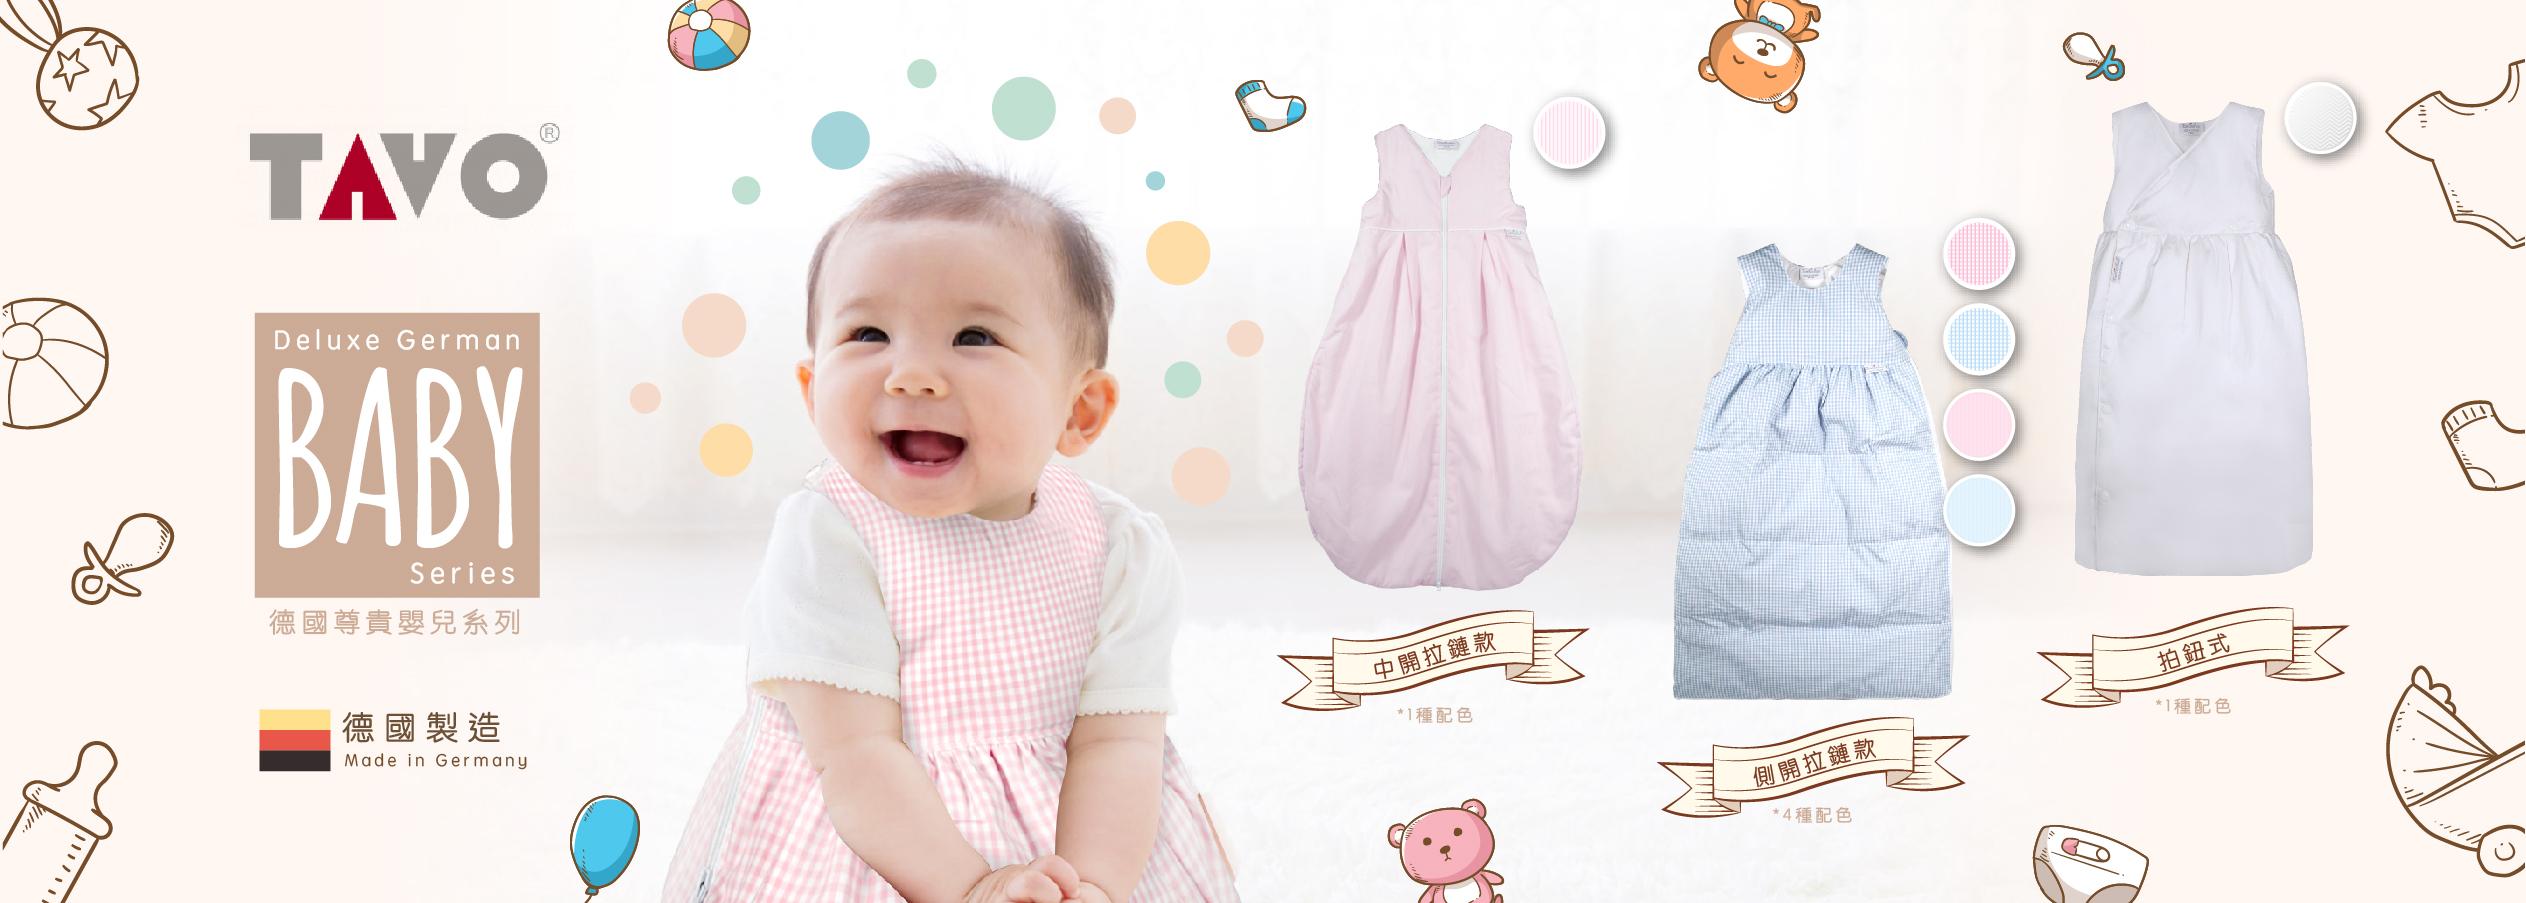 TAVO 德國尊貴嬰兒系列